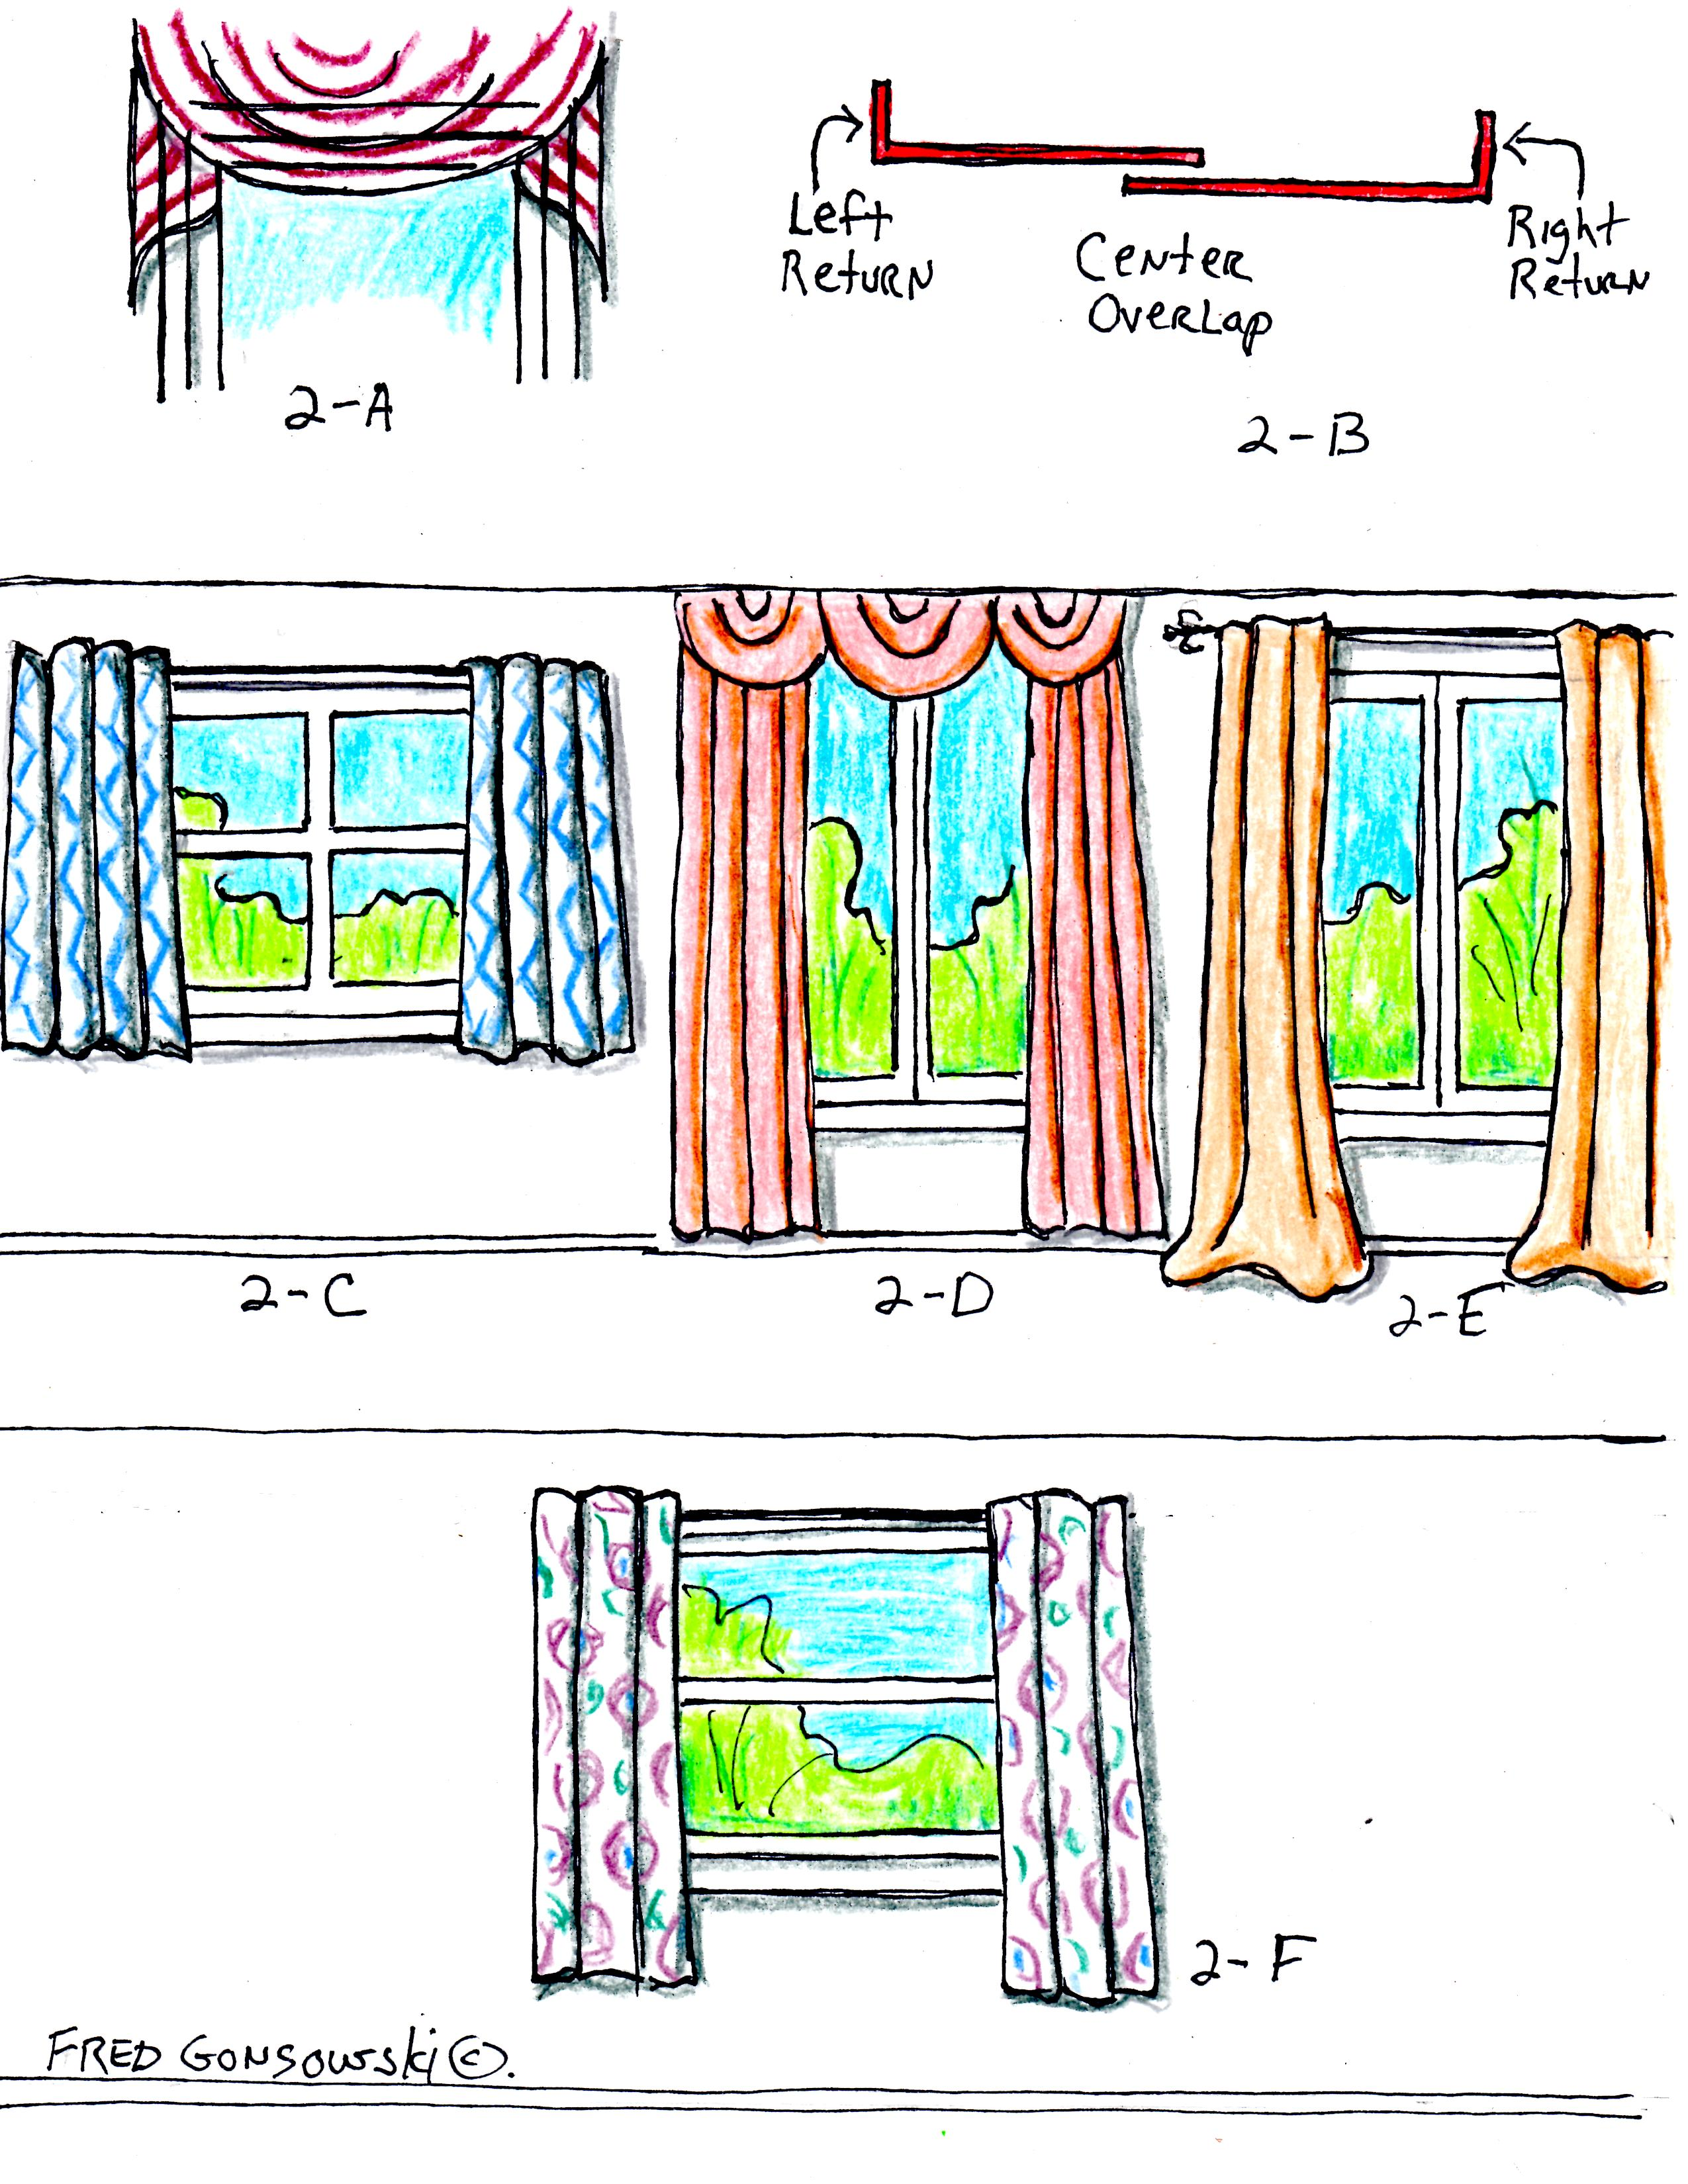 to hang curtains and drapes